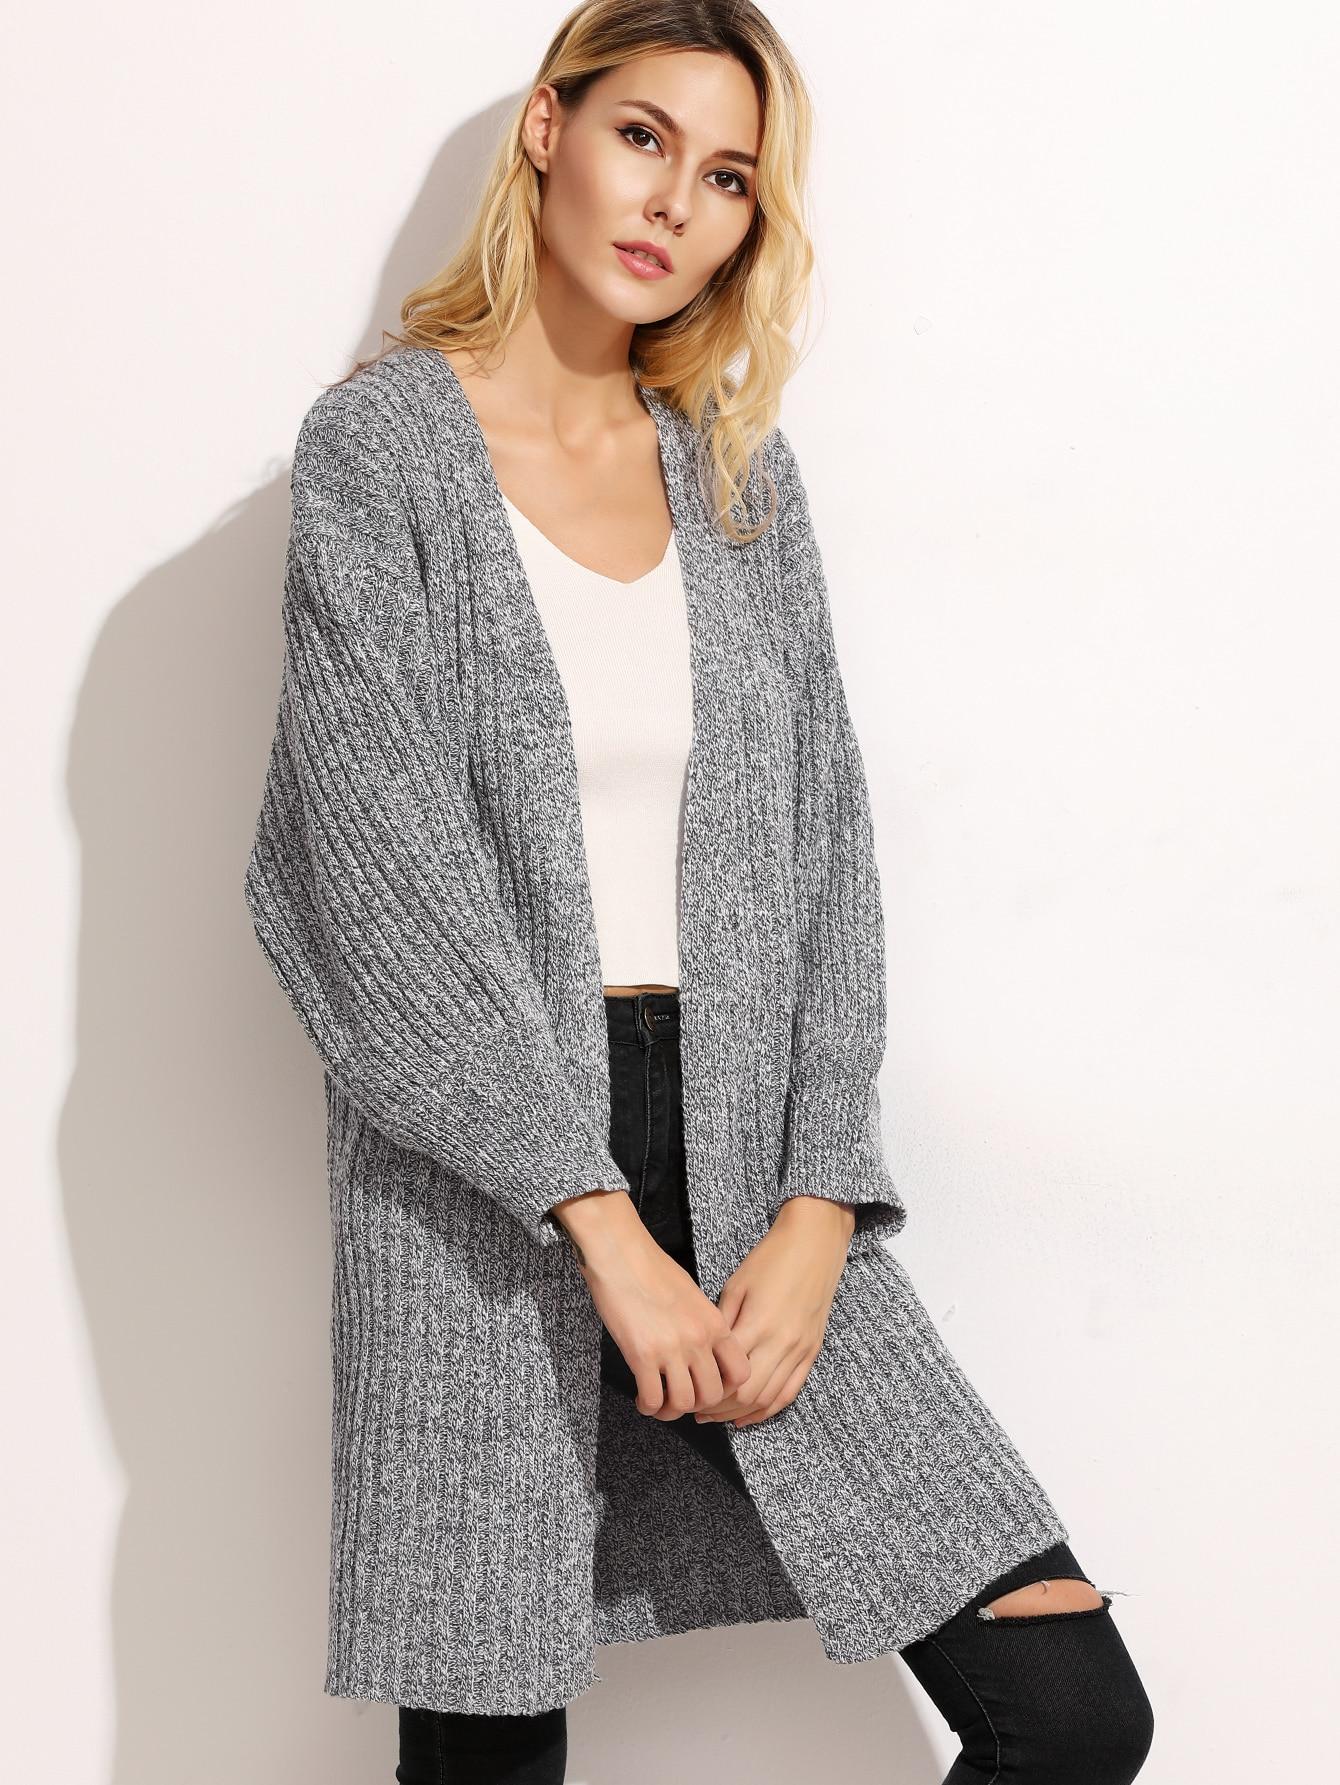 Heather Grey Drop Shoulder Ribbed Cardigan sweater160922003